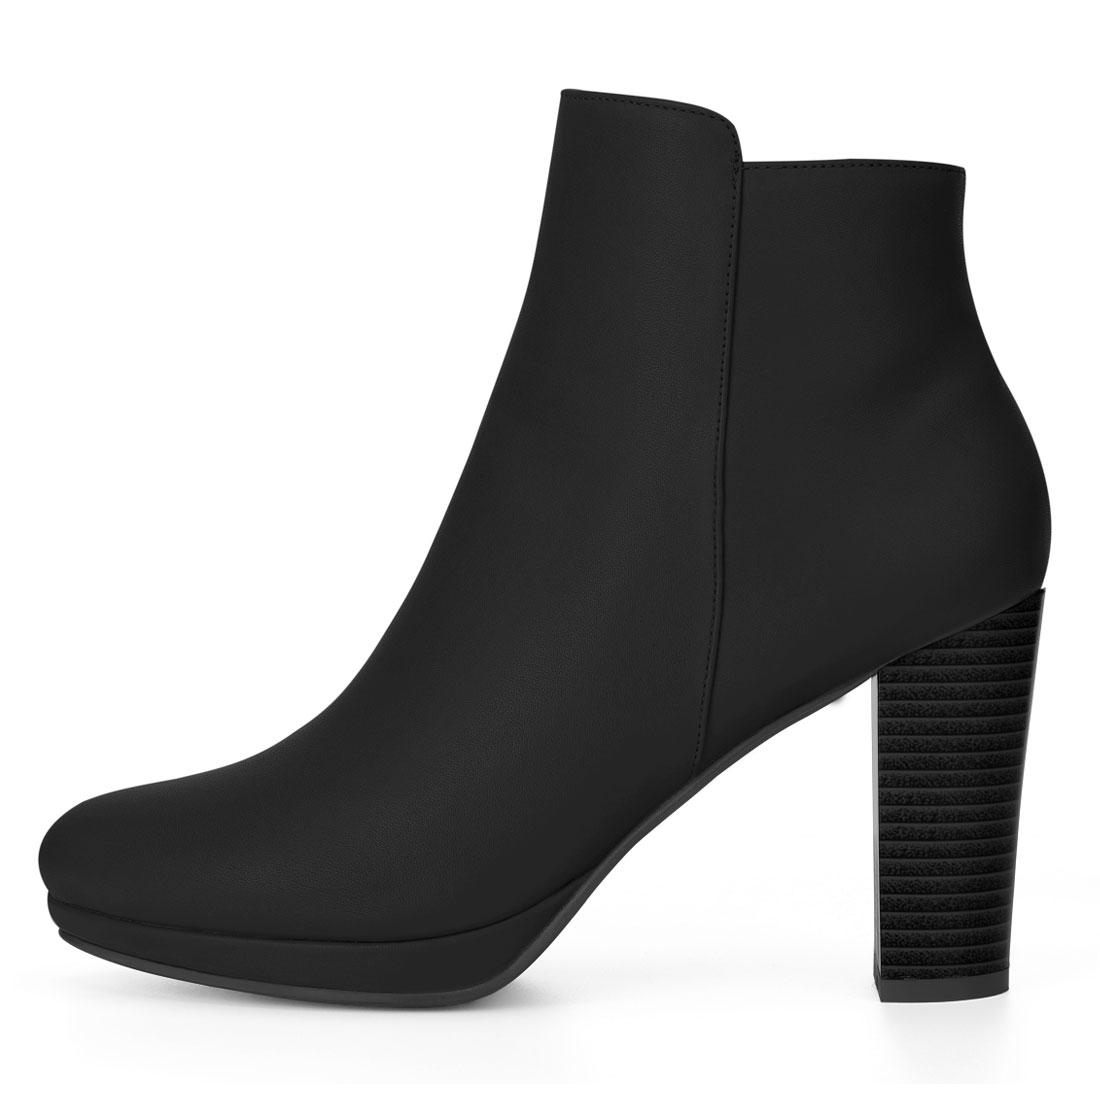 Allegra K Women Round Toe Chunky Heel Platform Ankle Boots Black US 9.5